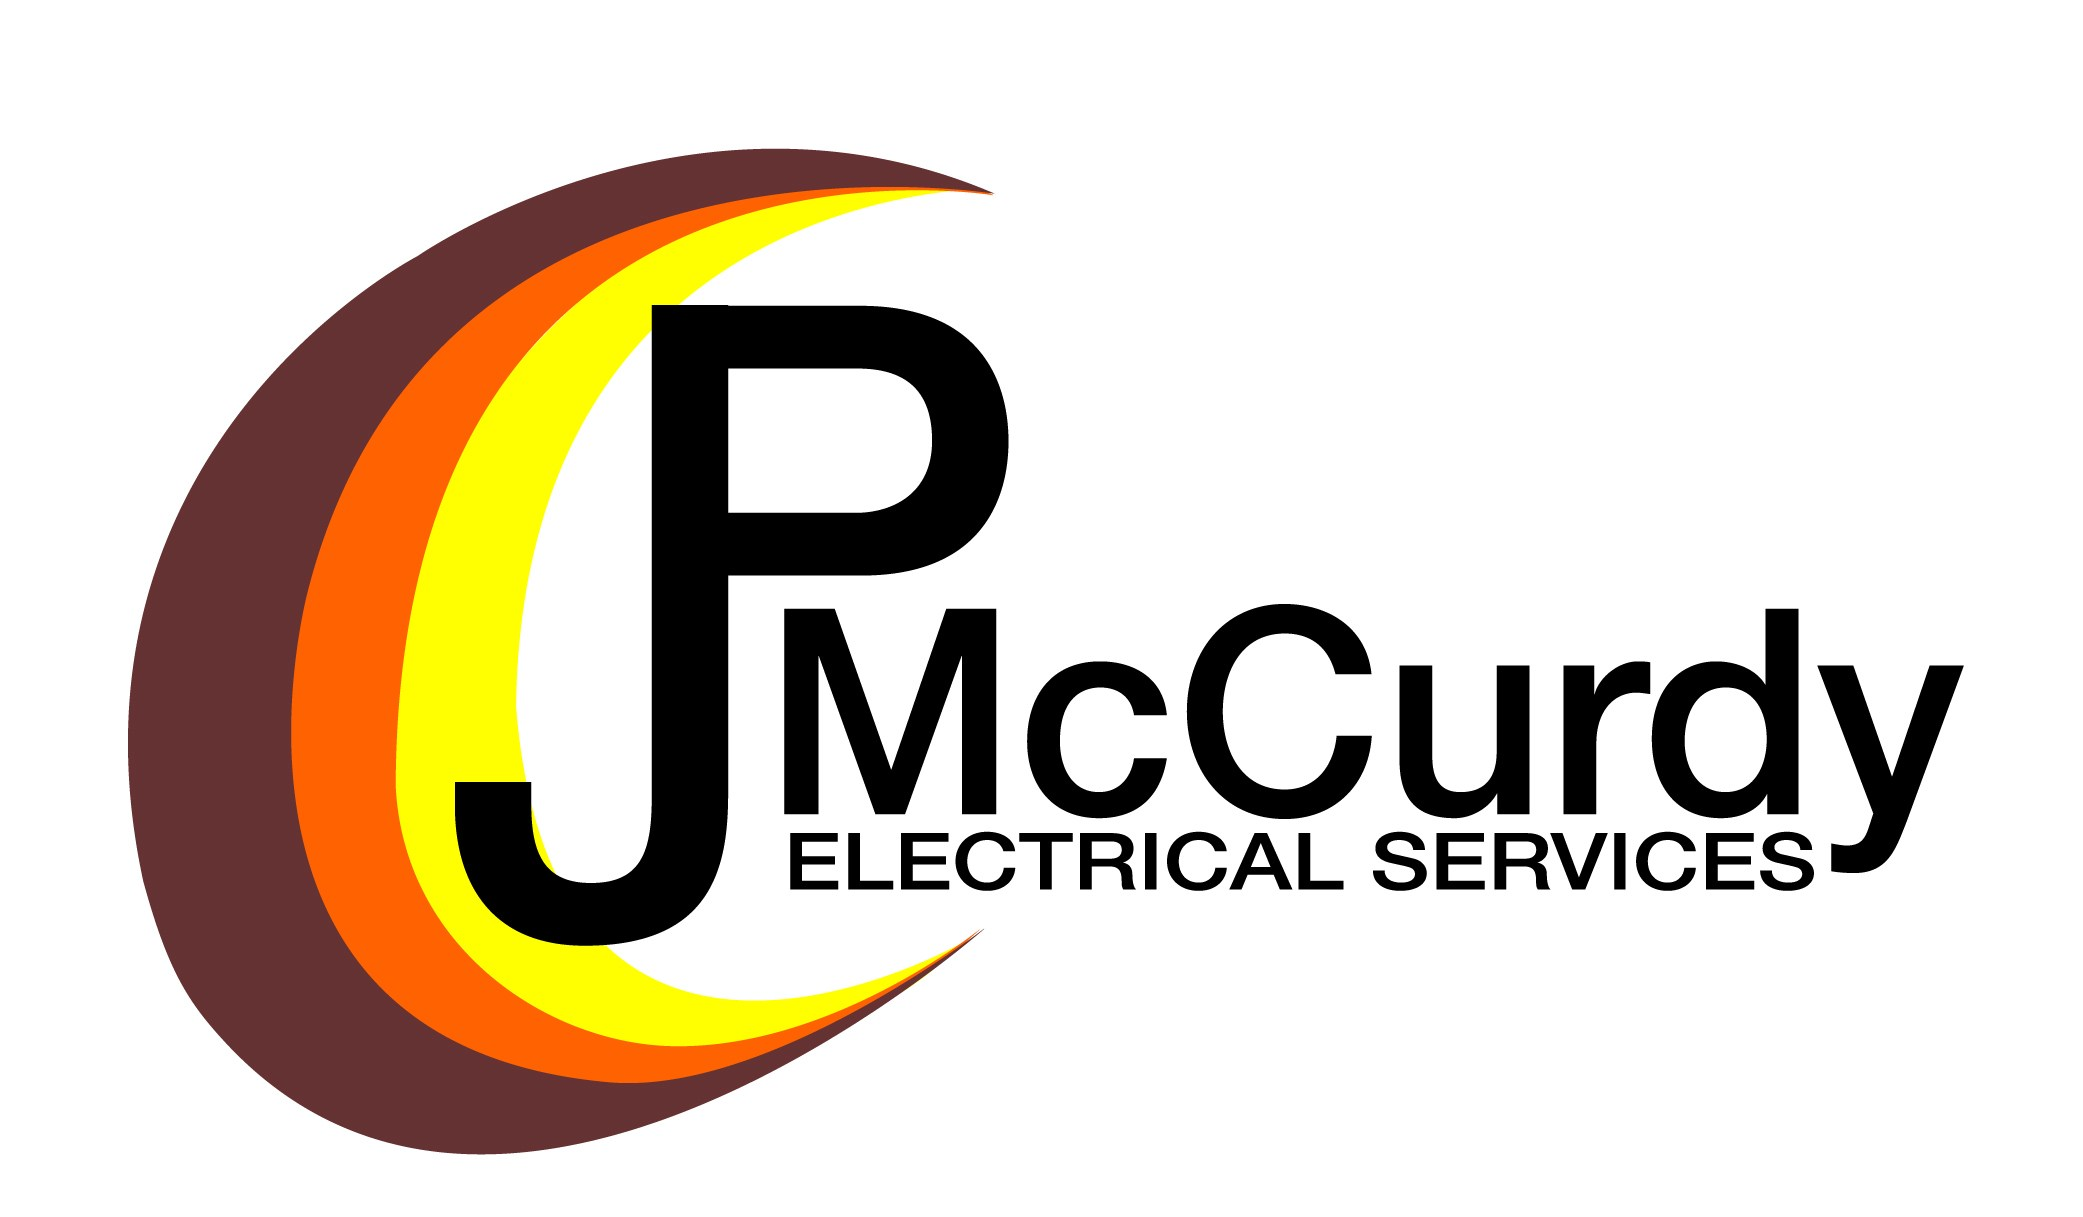 JP McCurdy Electrical Services Inc Reviews - Lynn, MA ... on